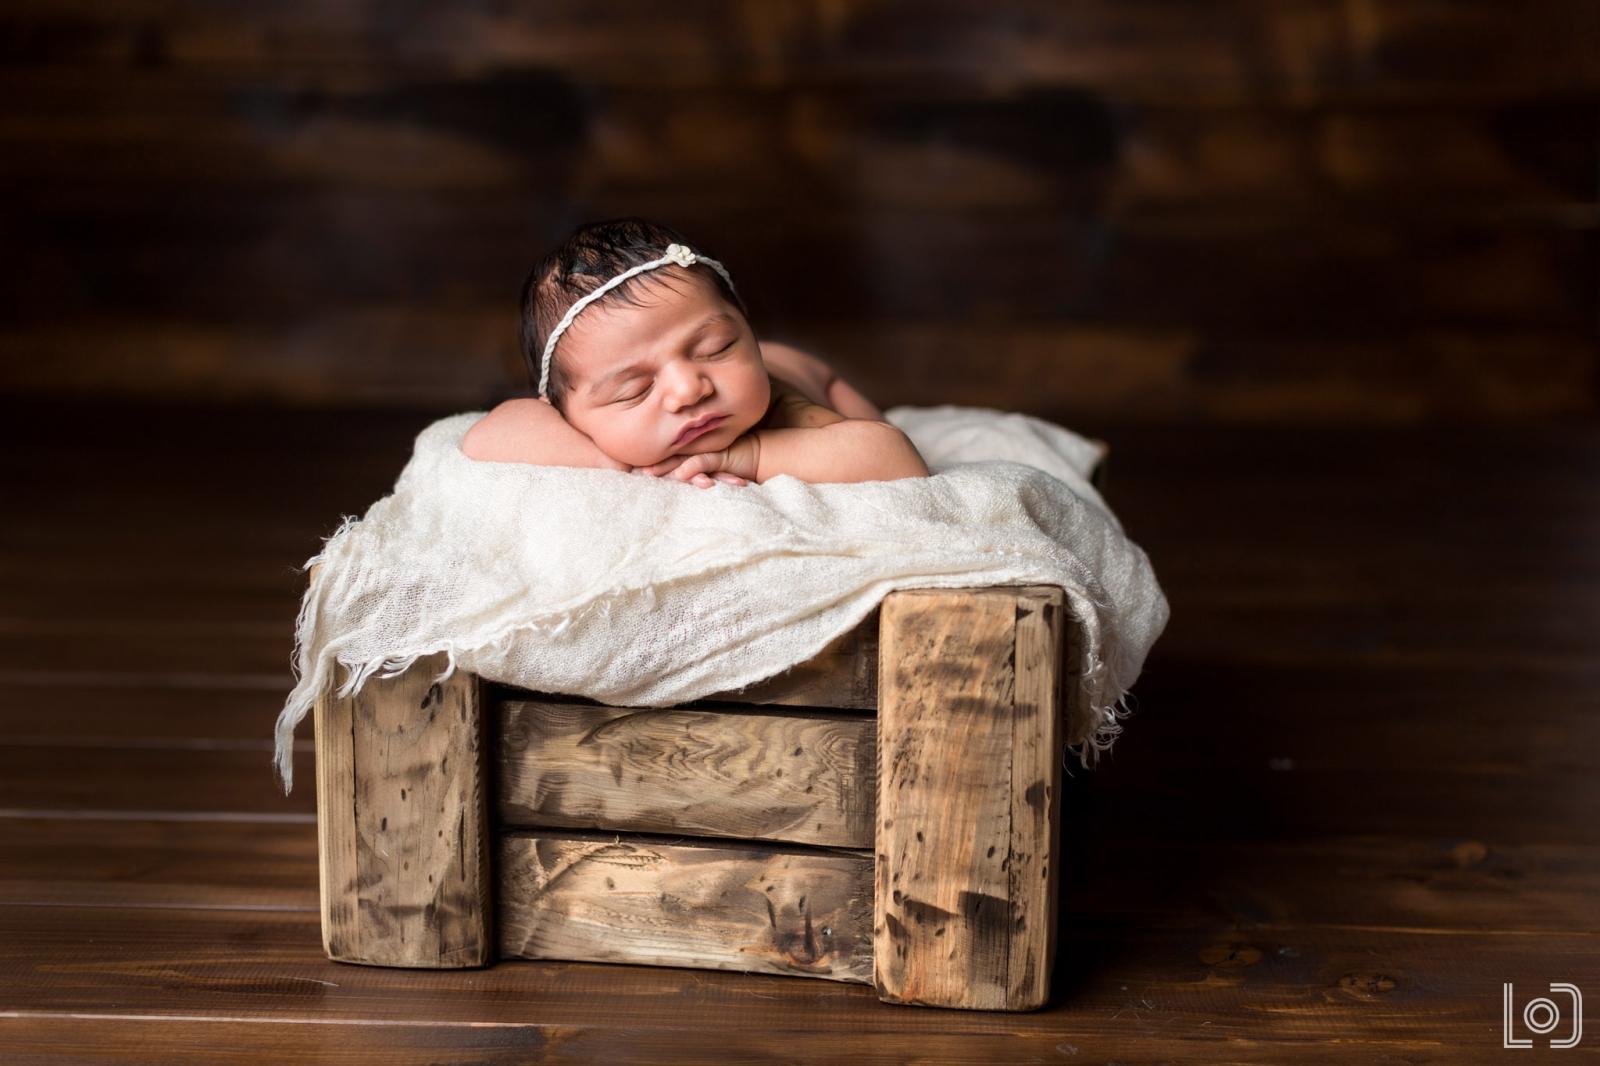 newbornfotograaf-nijmegen-beuningen-wijchen-arnhem-newbornfotografie